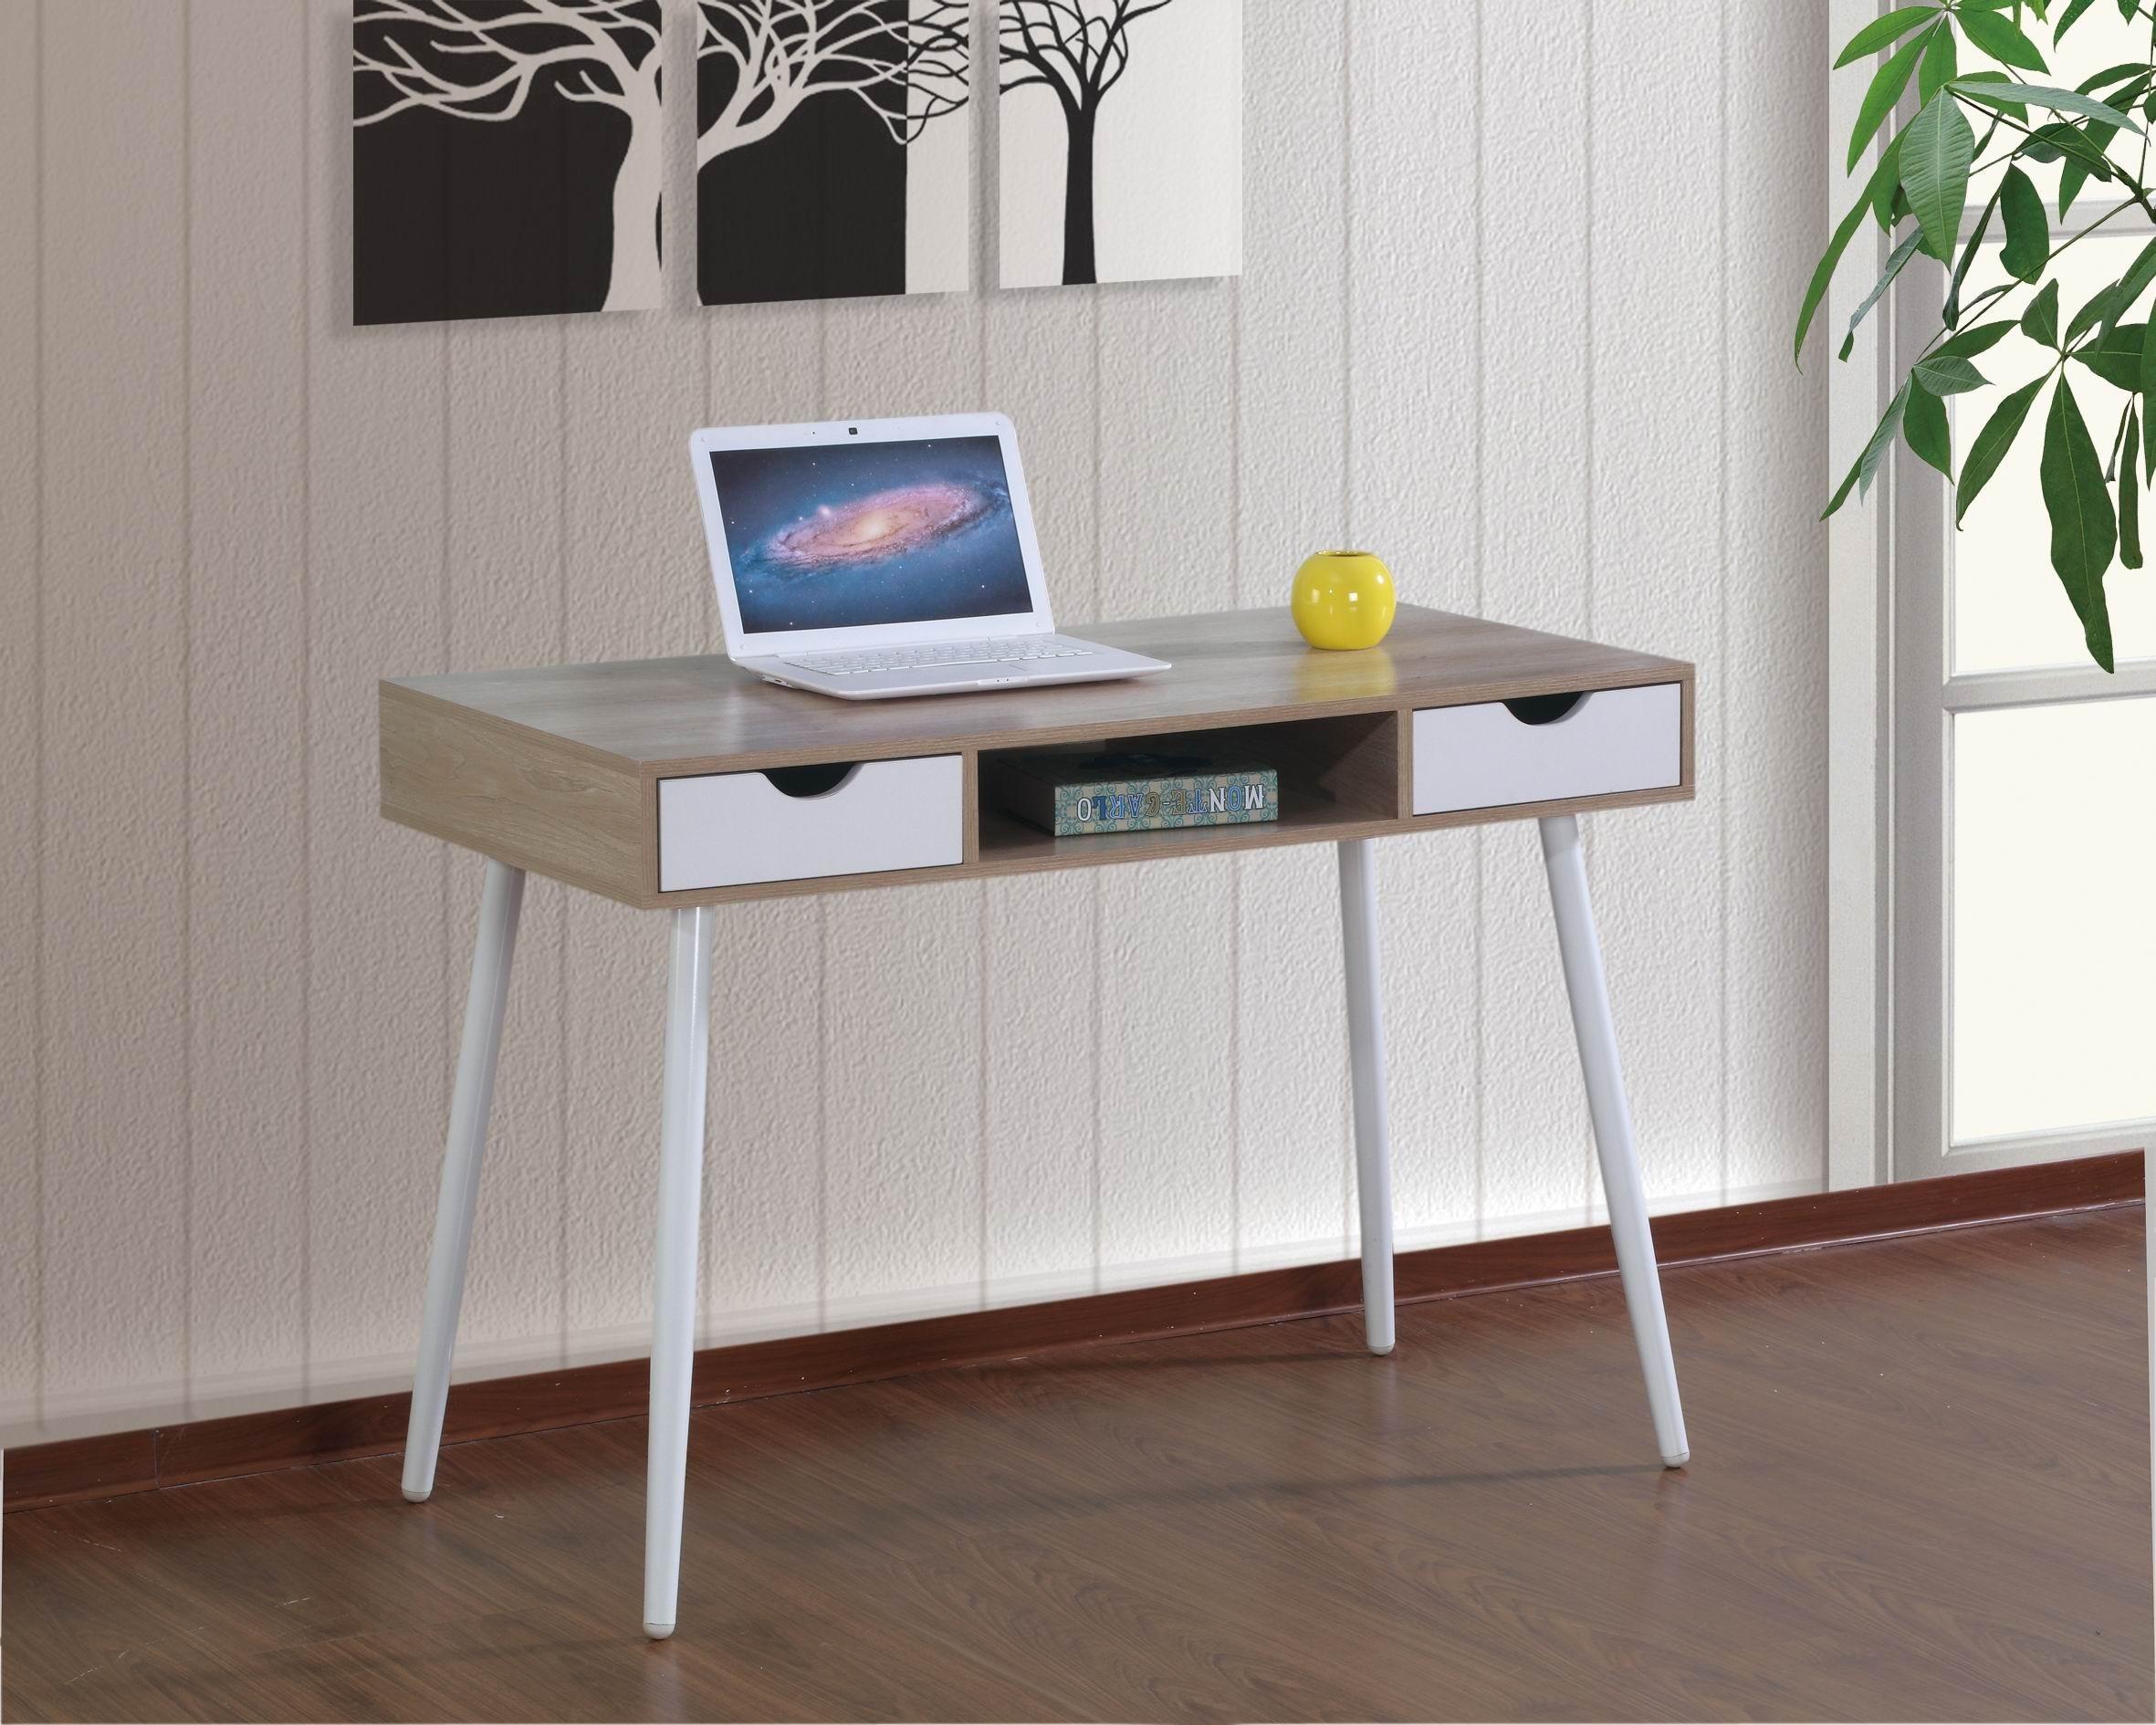 Sale Ronin Mid Century Modern Desk Tables Home Decor